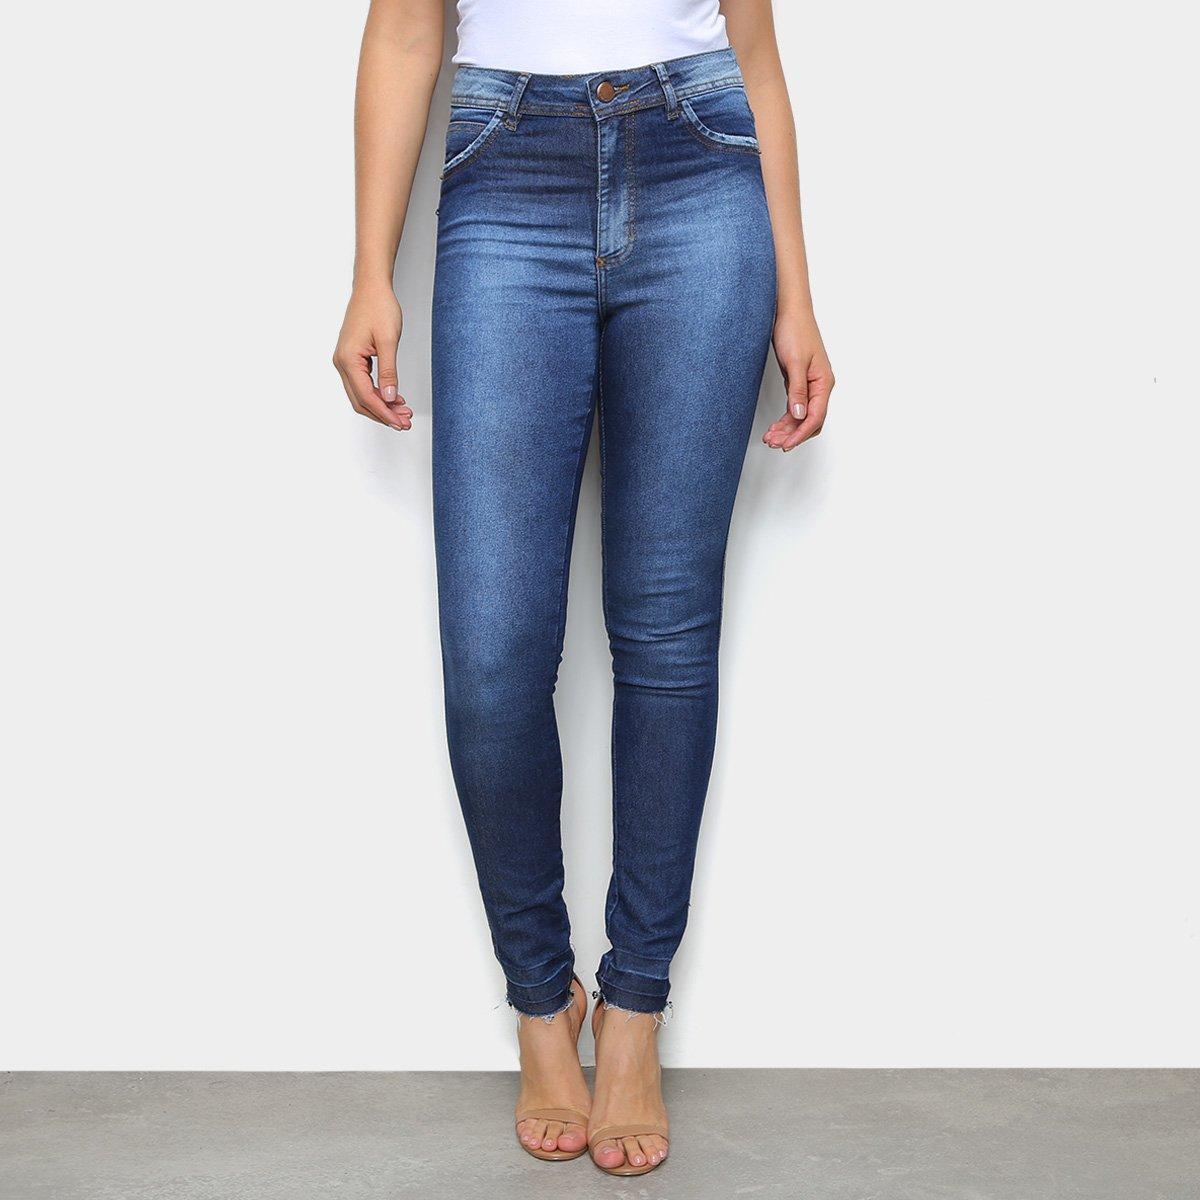 Calça Jeans Skinny TKS Puídos Cintura Média Feminina